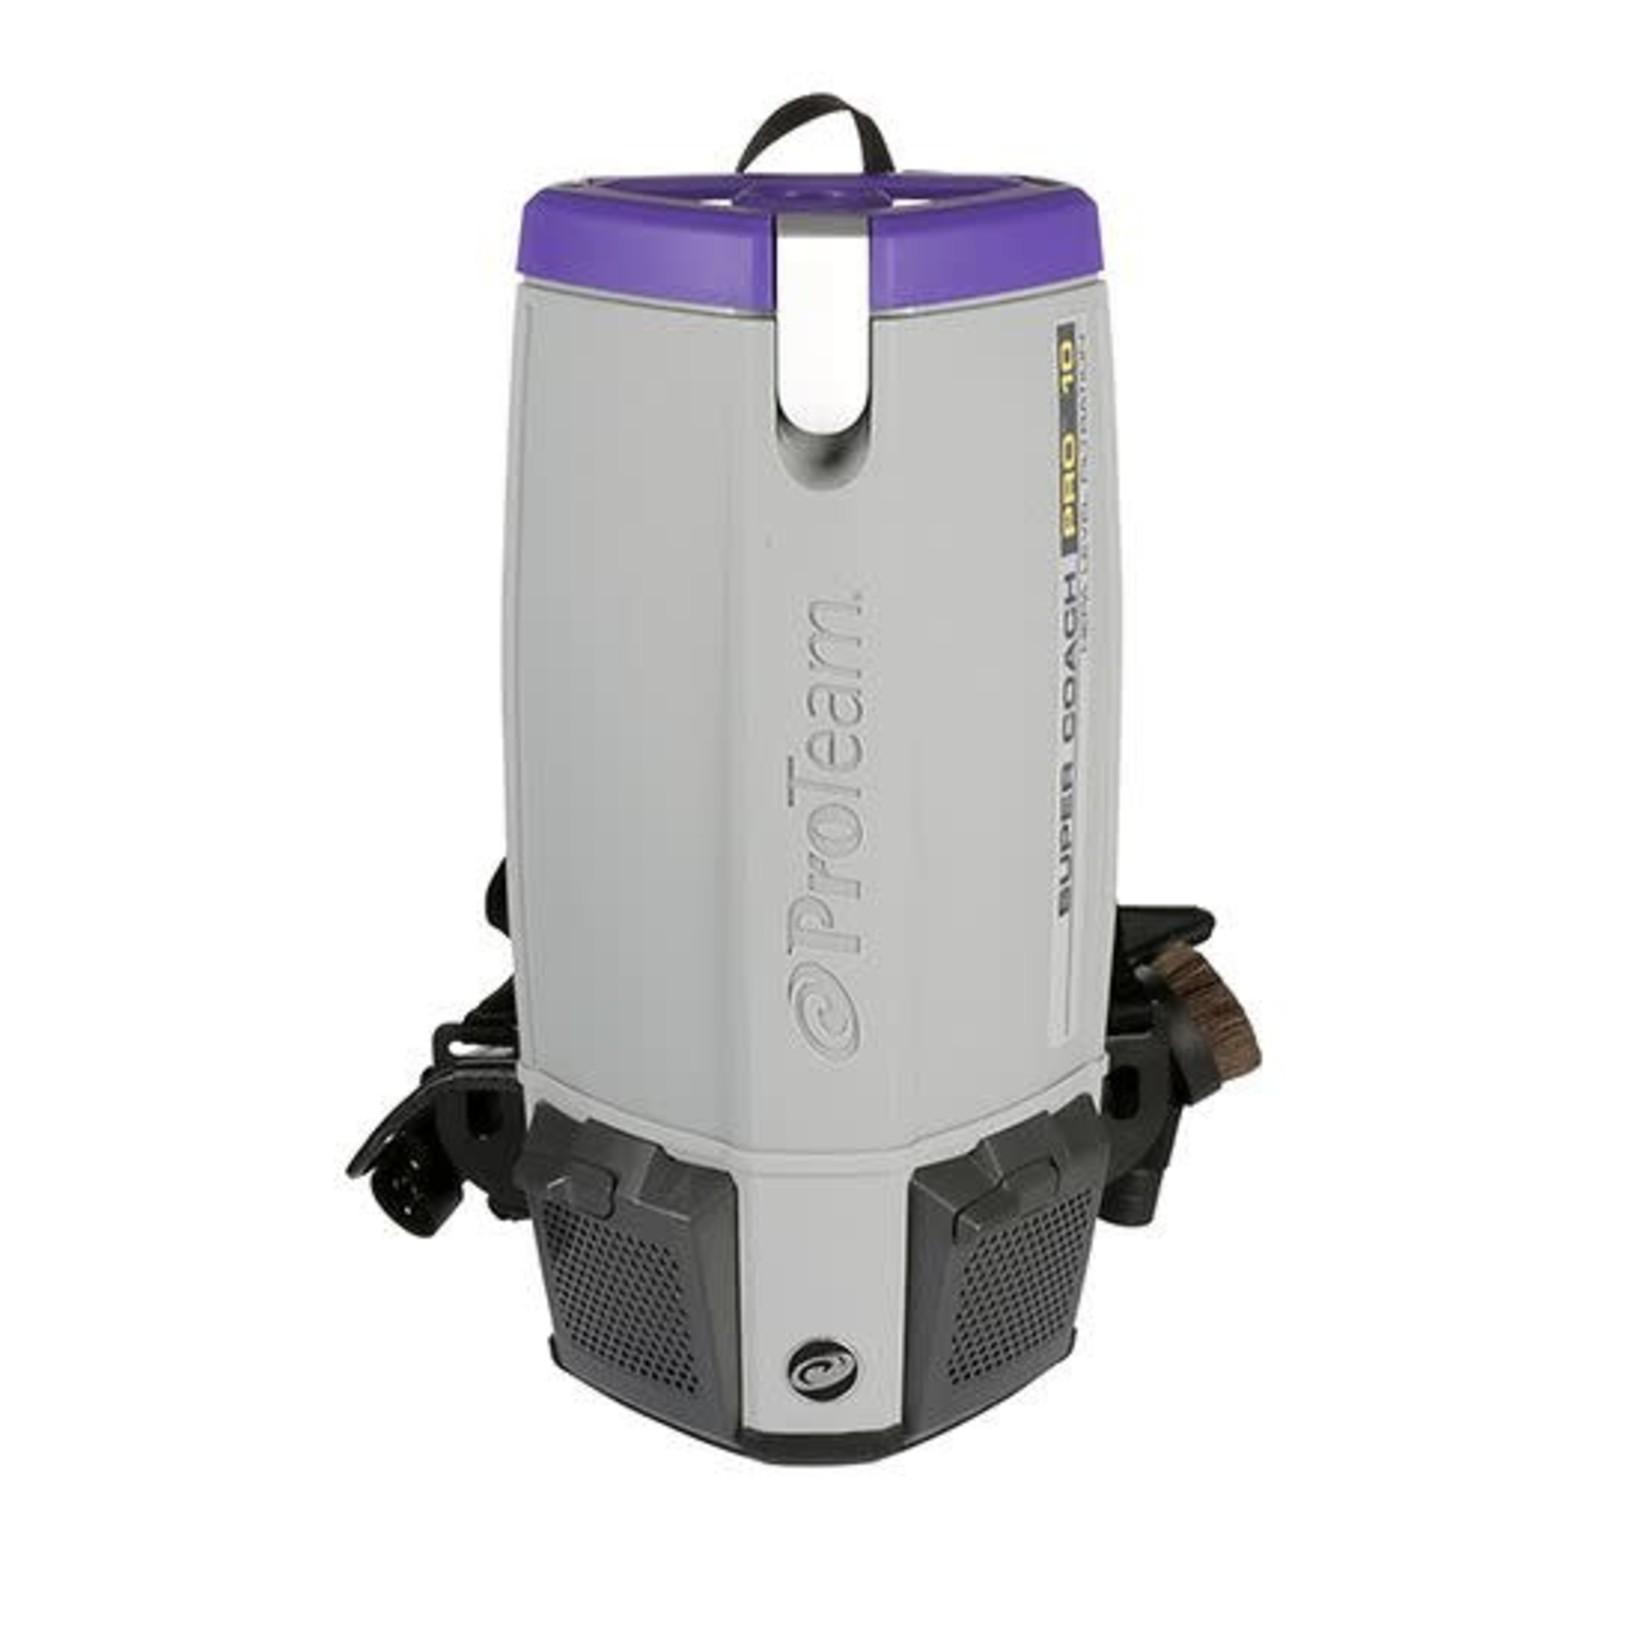 ProTeam Commercial Vacuums SUPER COACH PRO 10